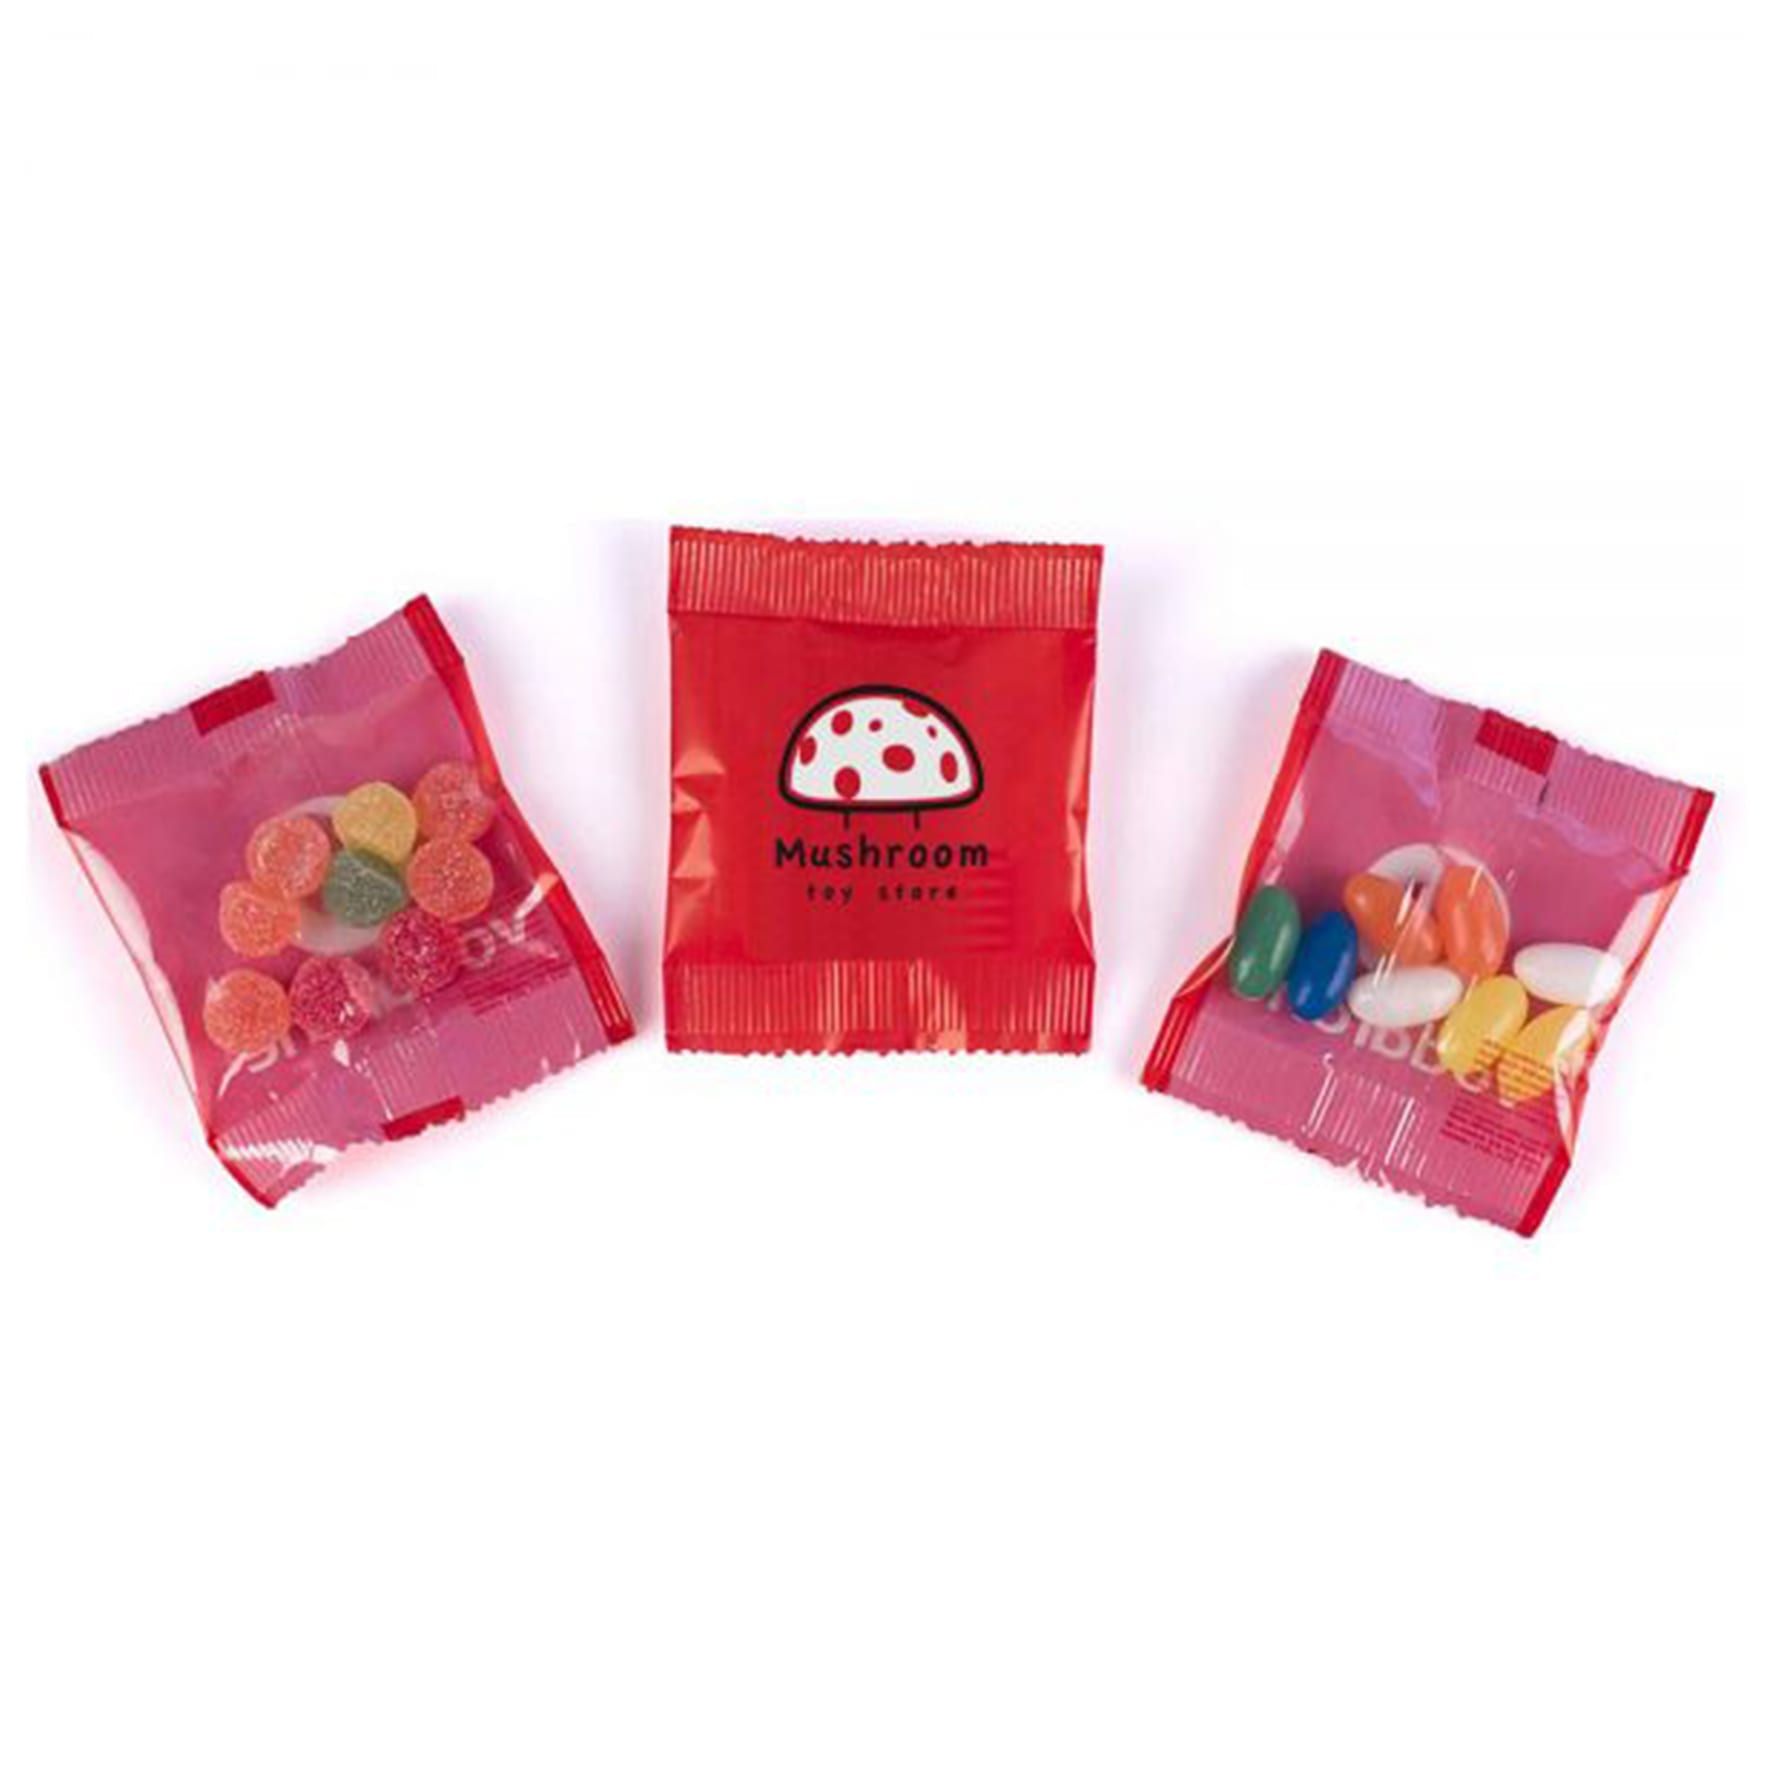 Sweets bag 25g